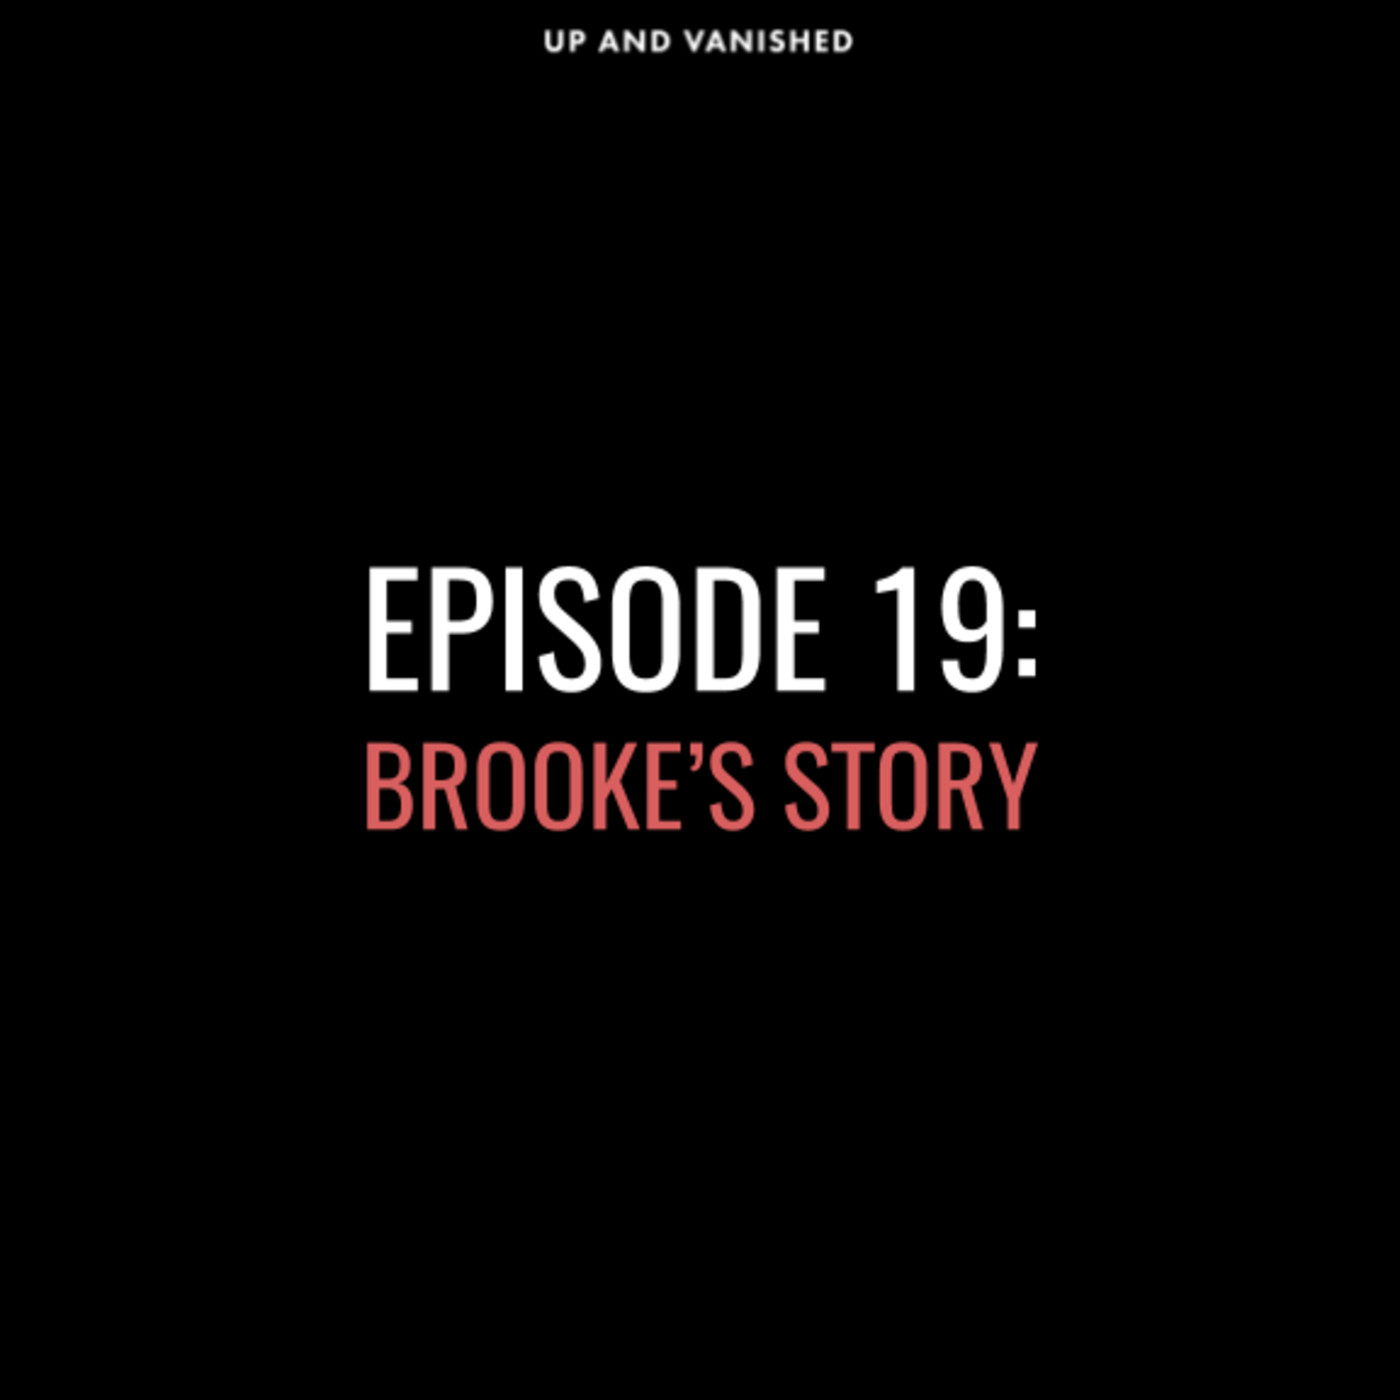 S1E19: Brooke's Story